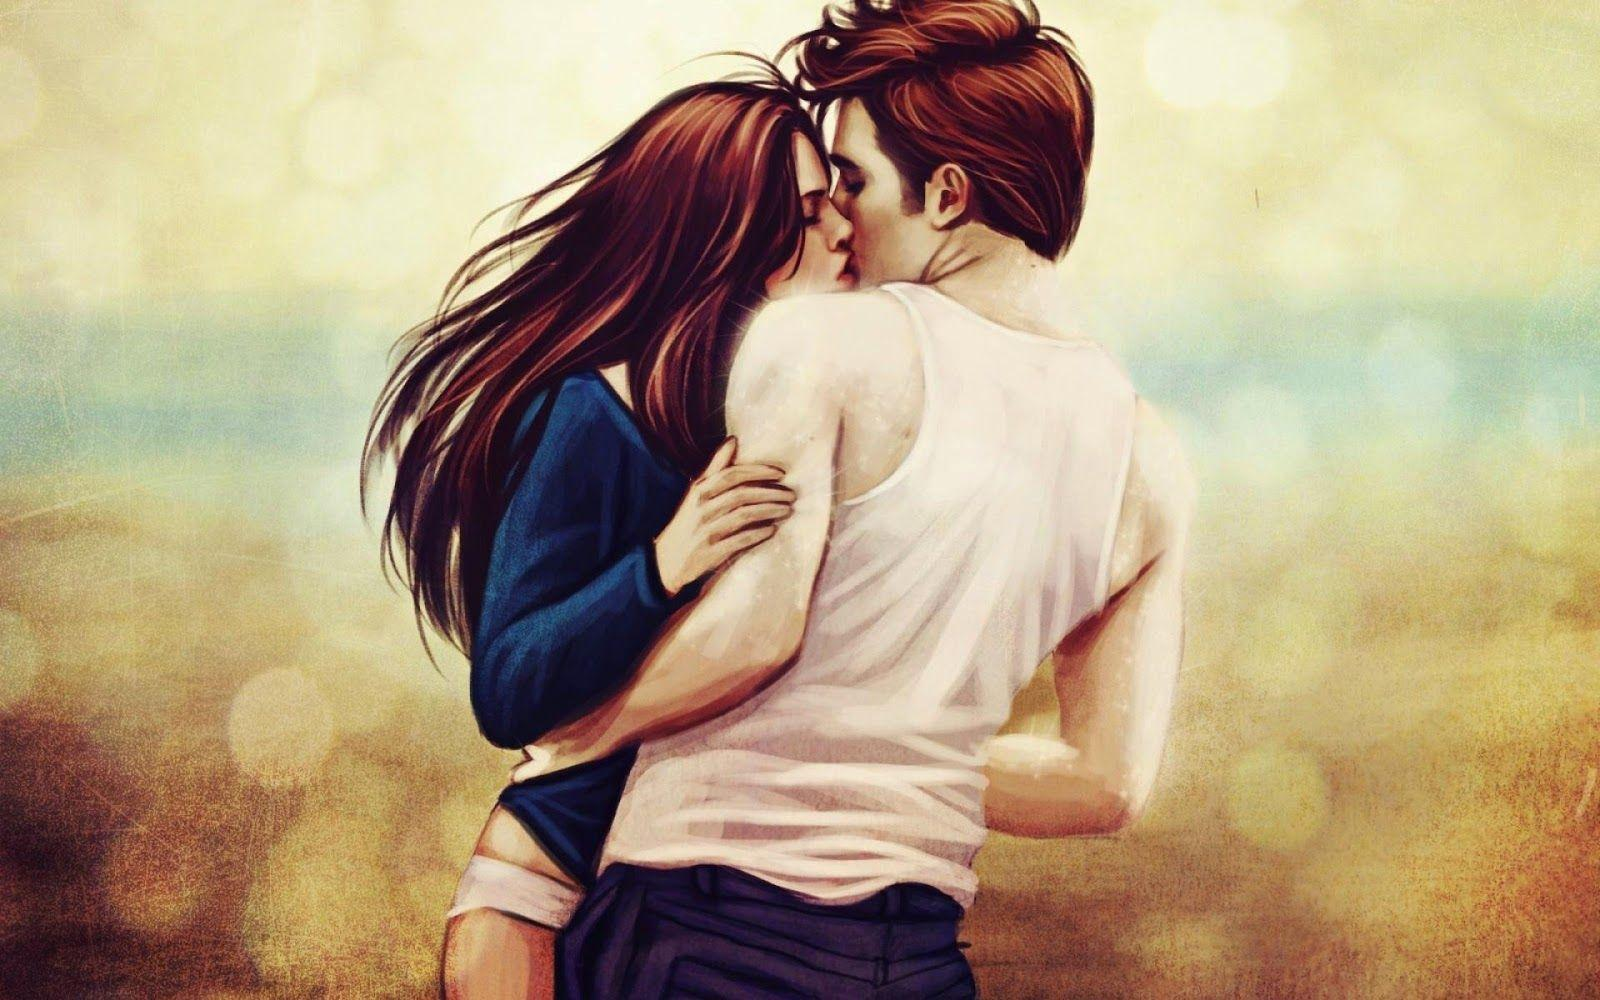 Romantic Kiss Wallpapers Top Free Romantic Kiss Backgrounds